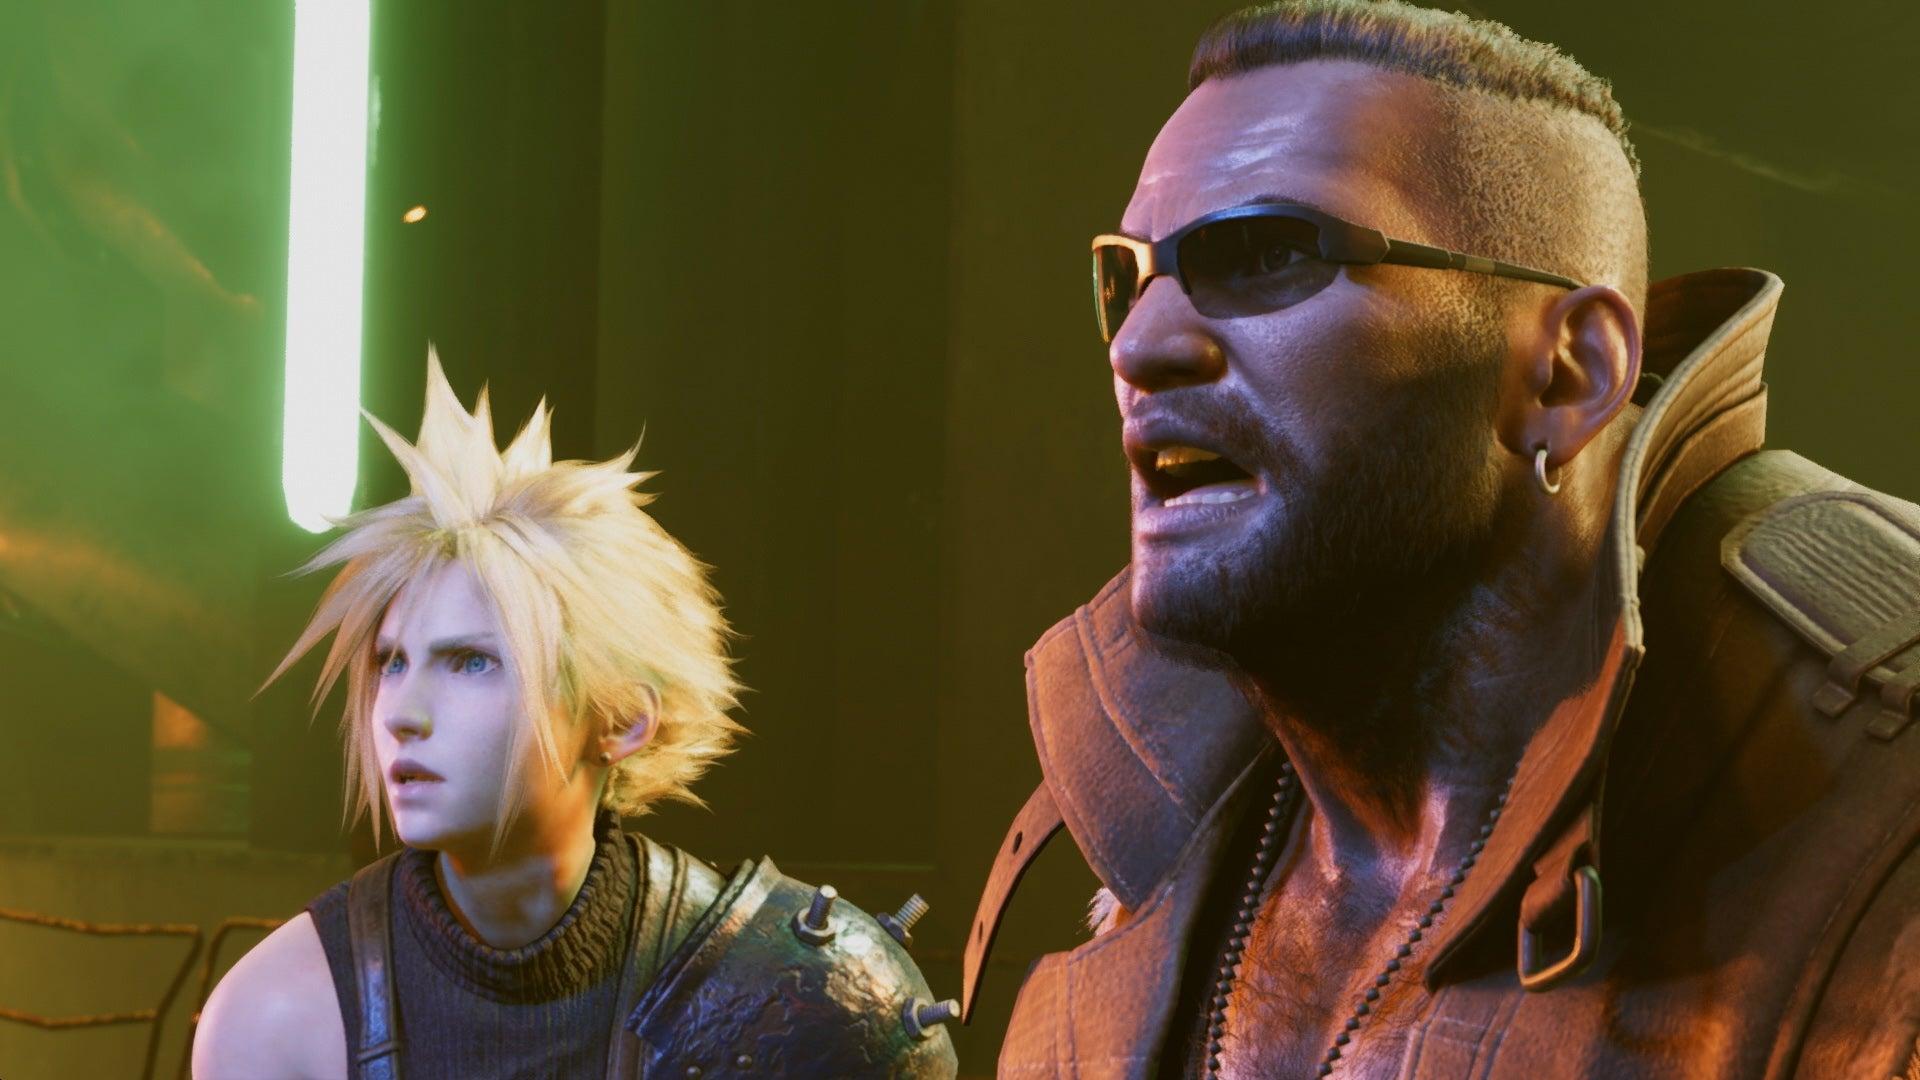 PSA: Don't Watch The Latest Final Fantasy VII Remake Trailer